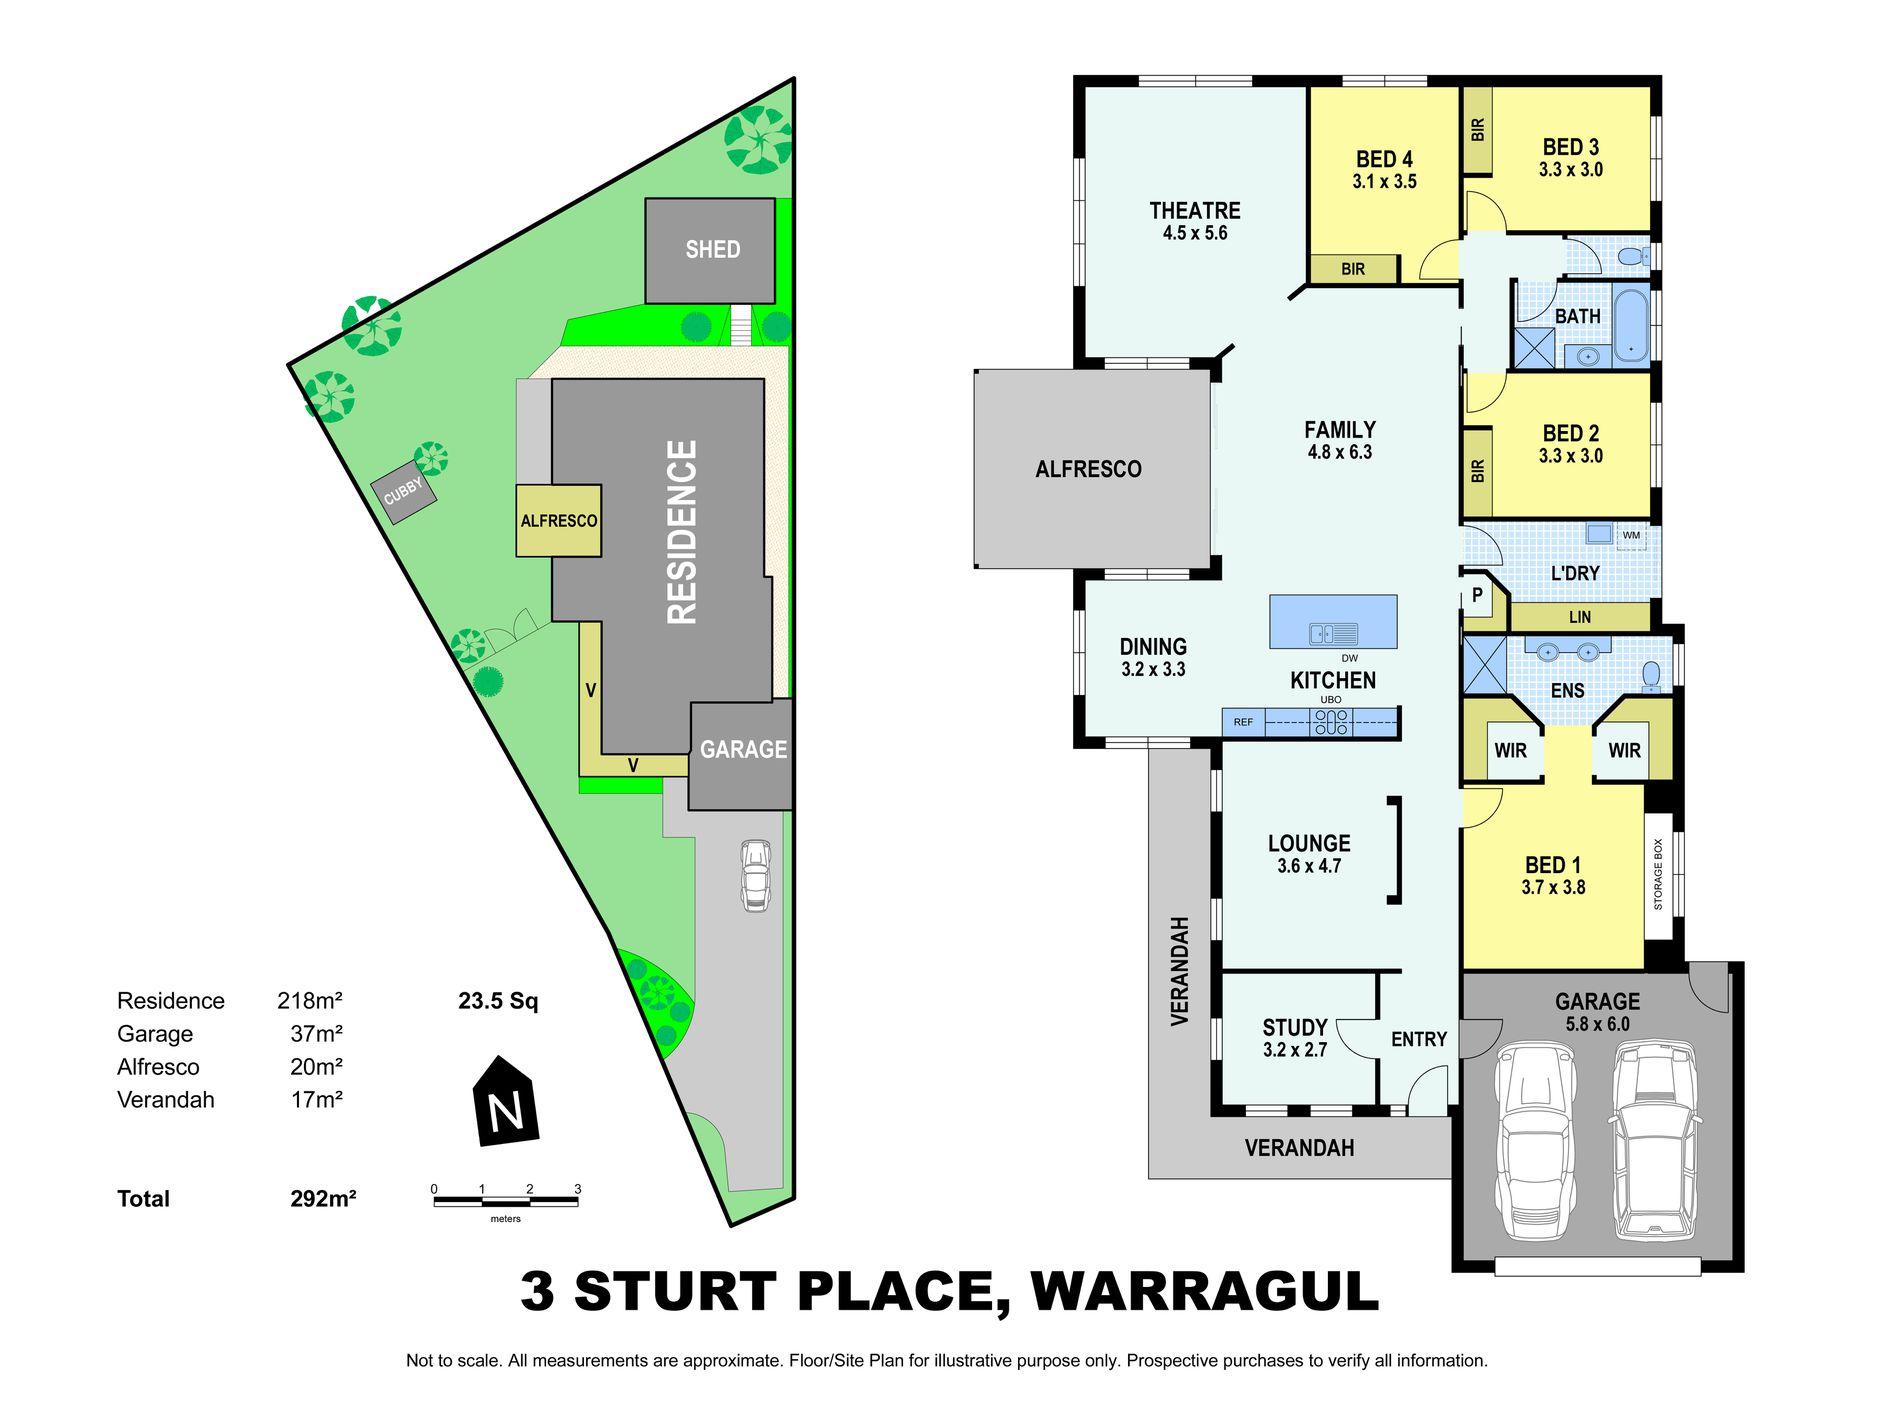 3 Sturt Place, Warragul